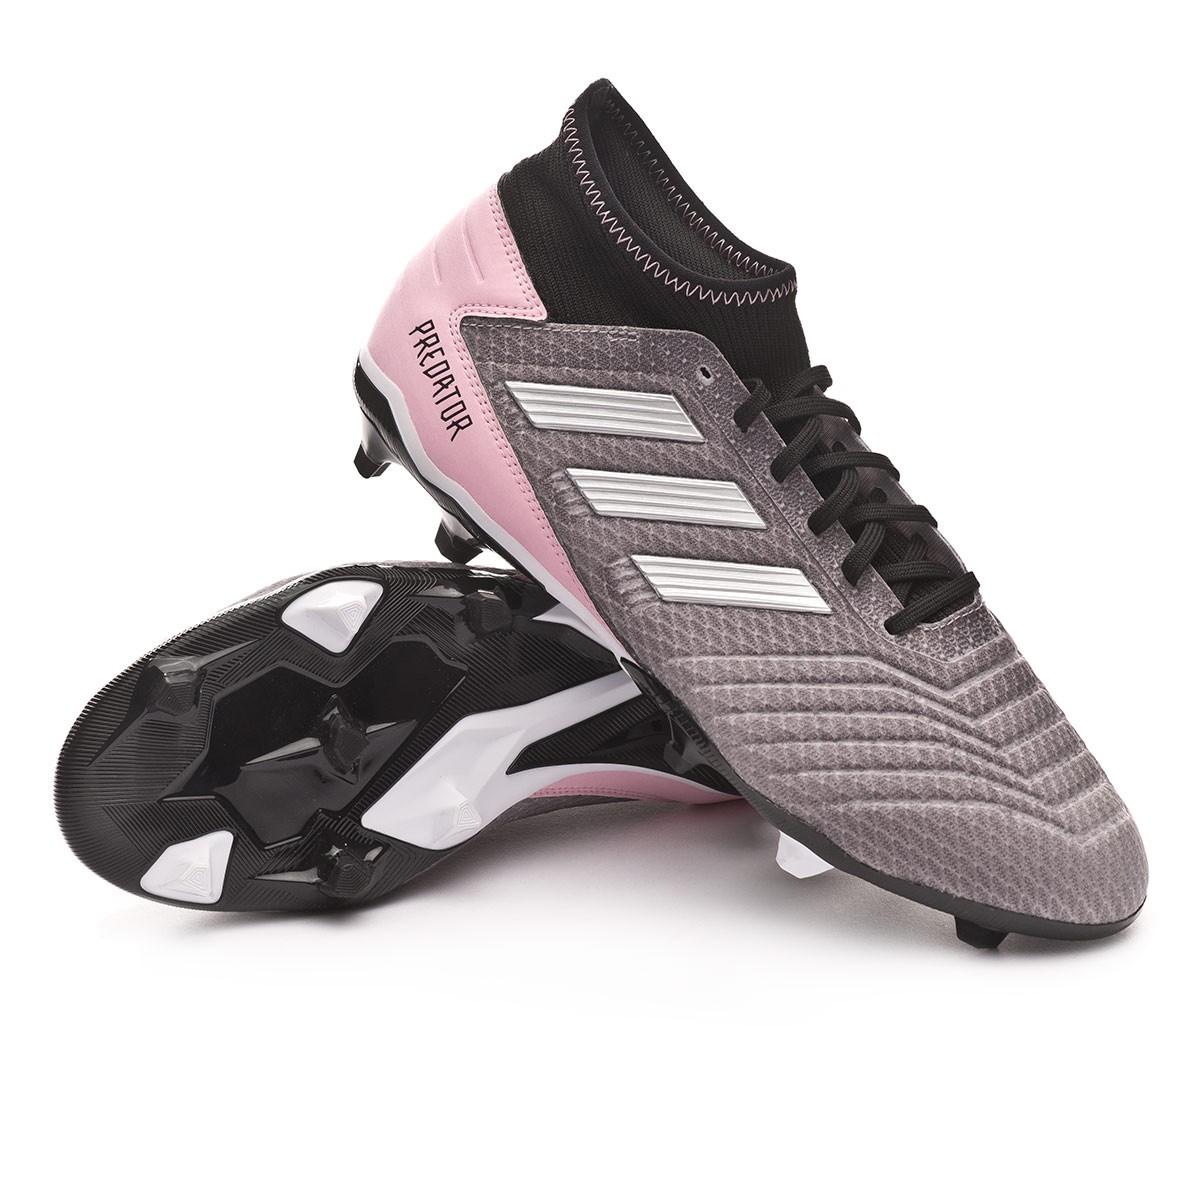 Adidas | Zapatos, Botas adidas mujer y Botas adidas